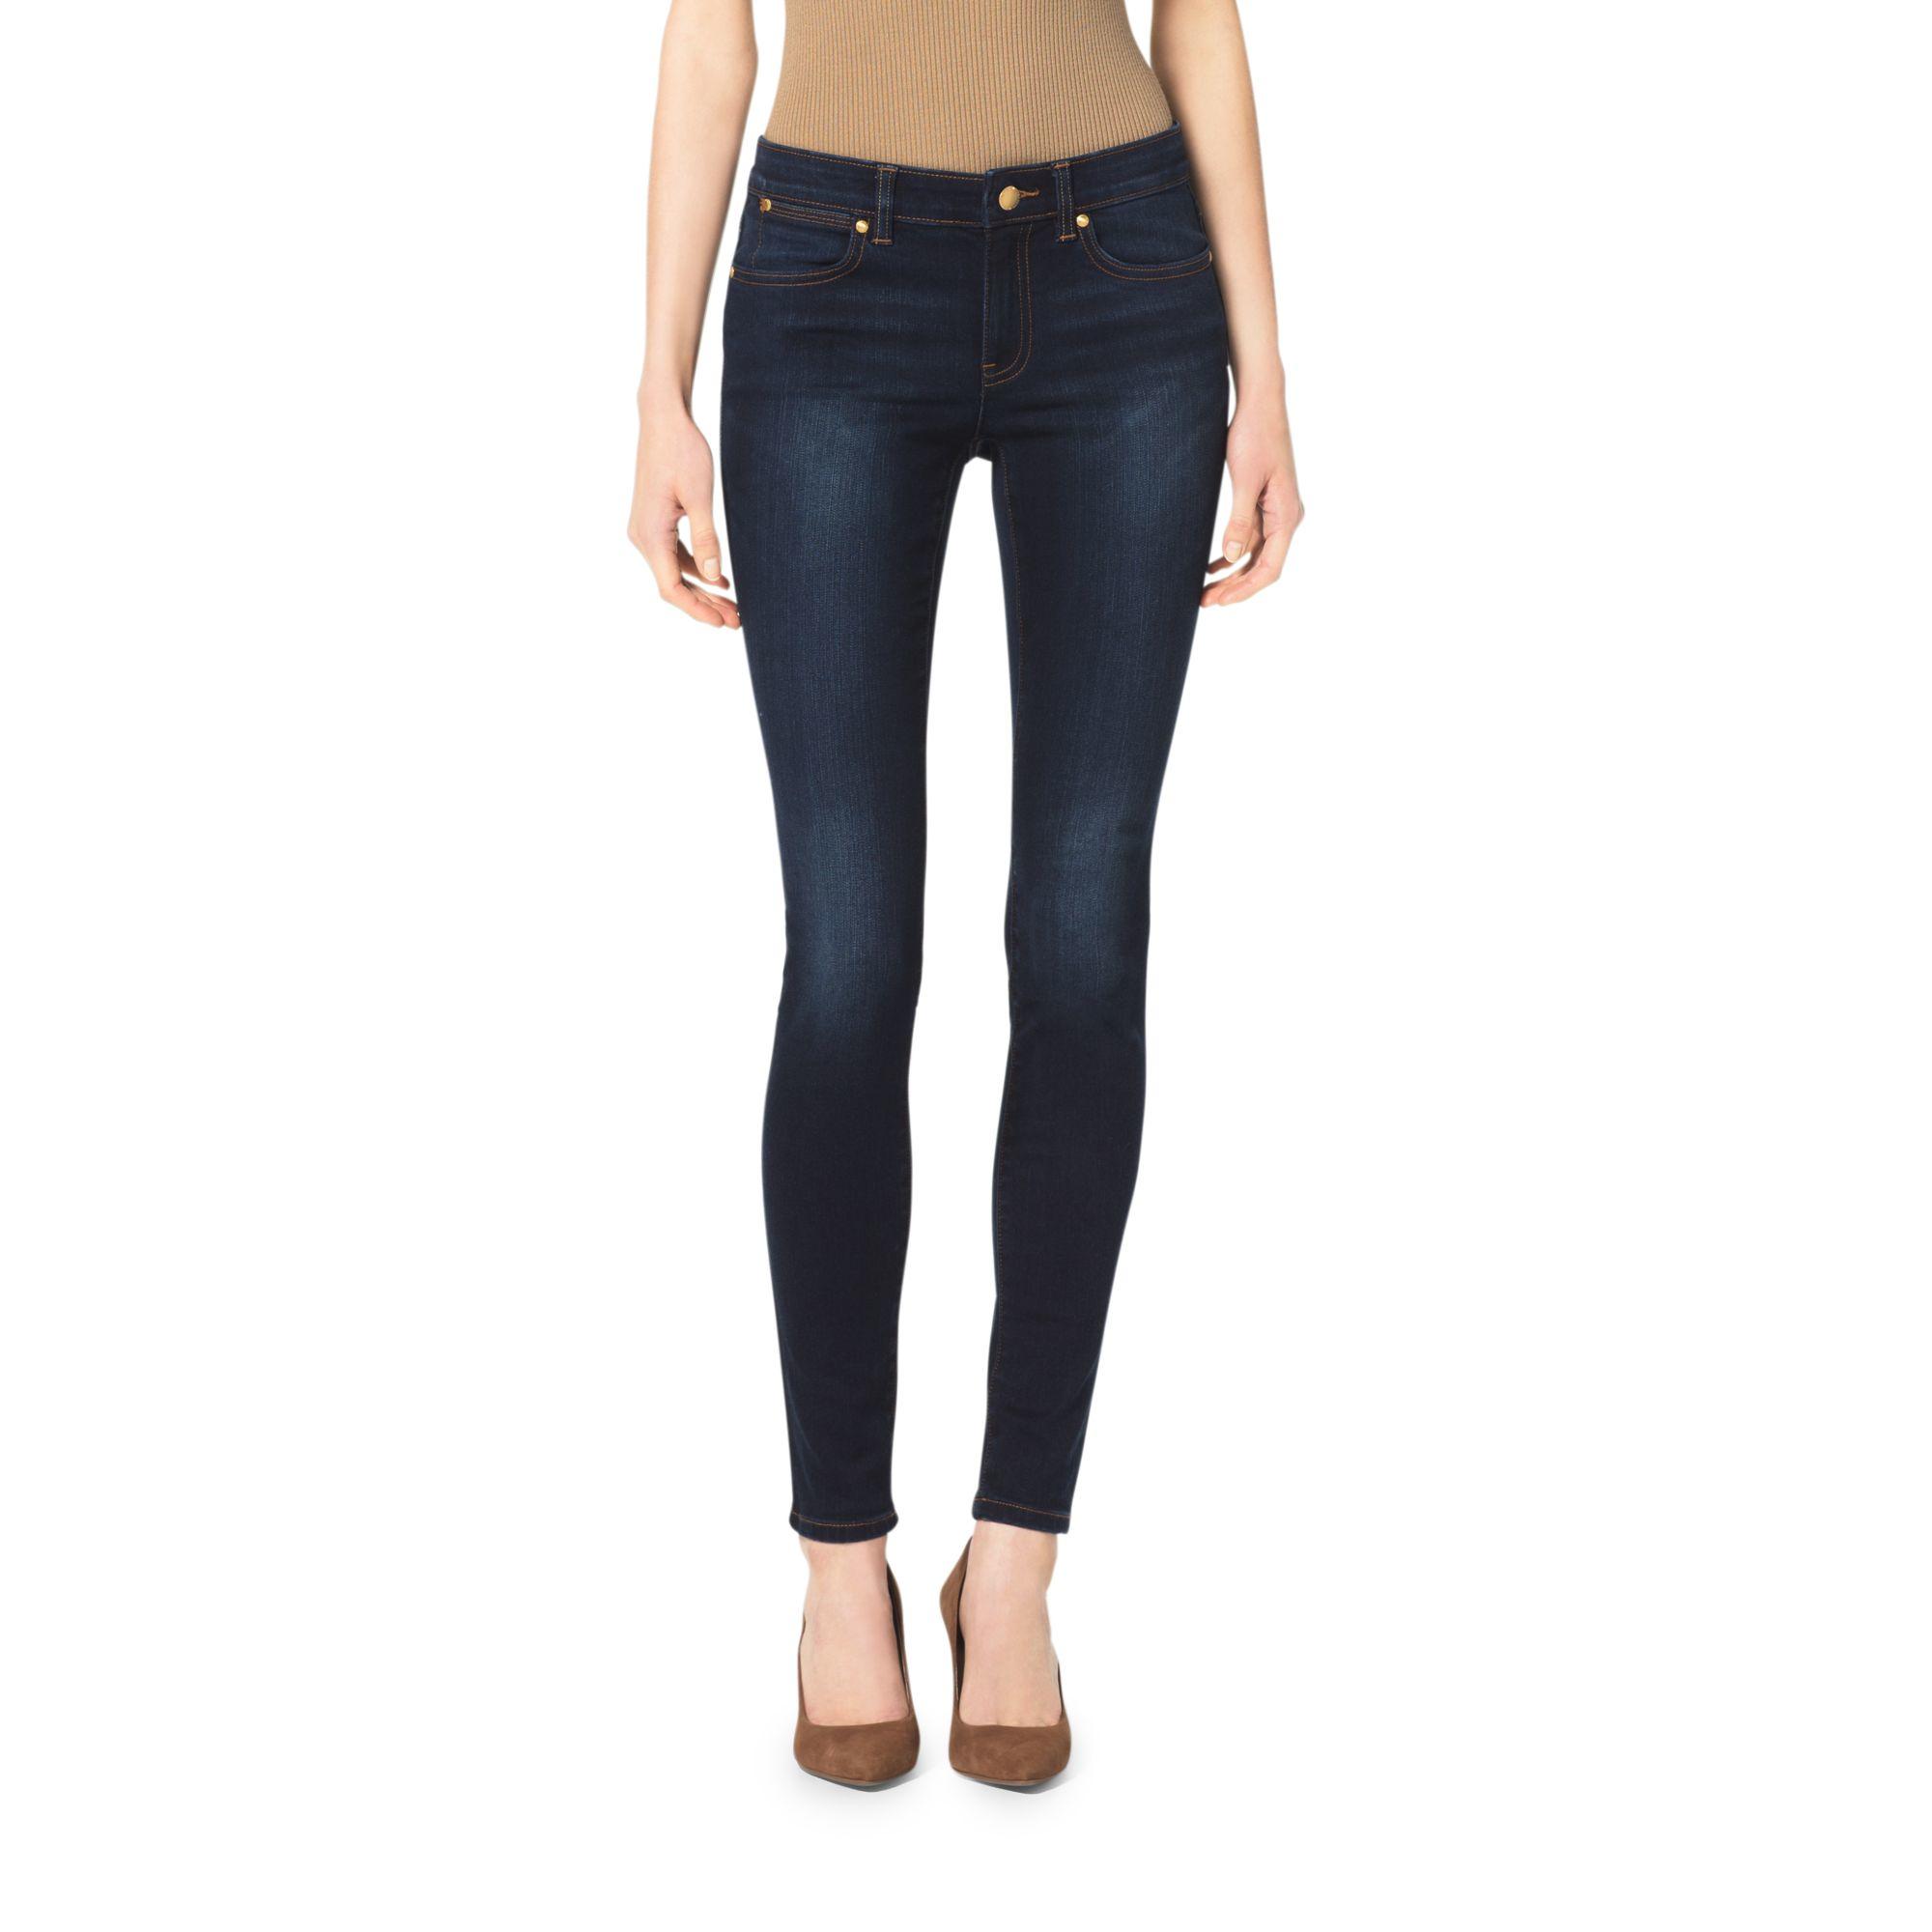 Michael kors Dark Wash Skinny Jeans in Blue | Lyst